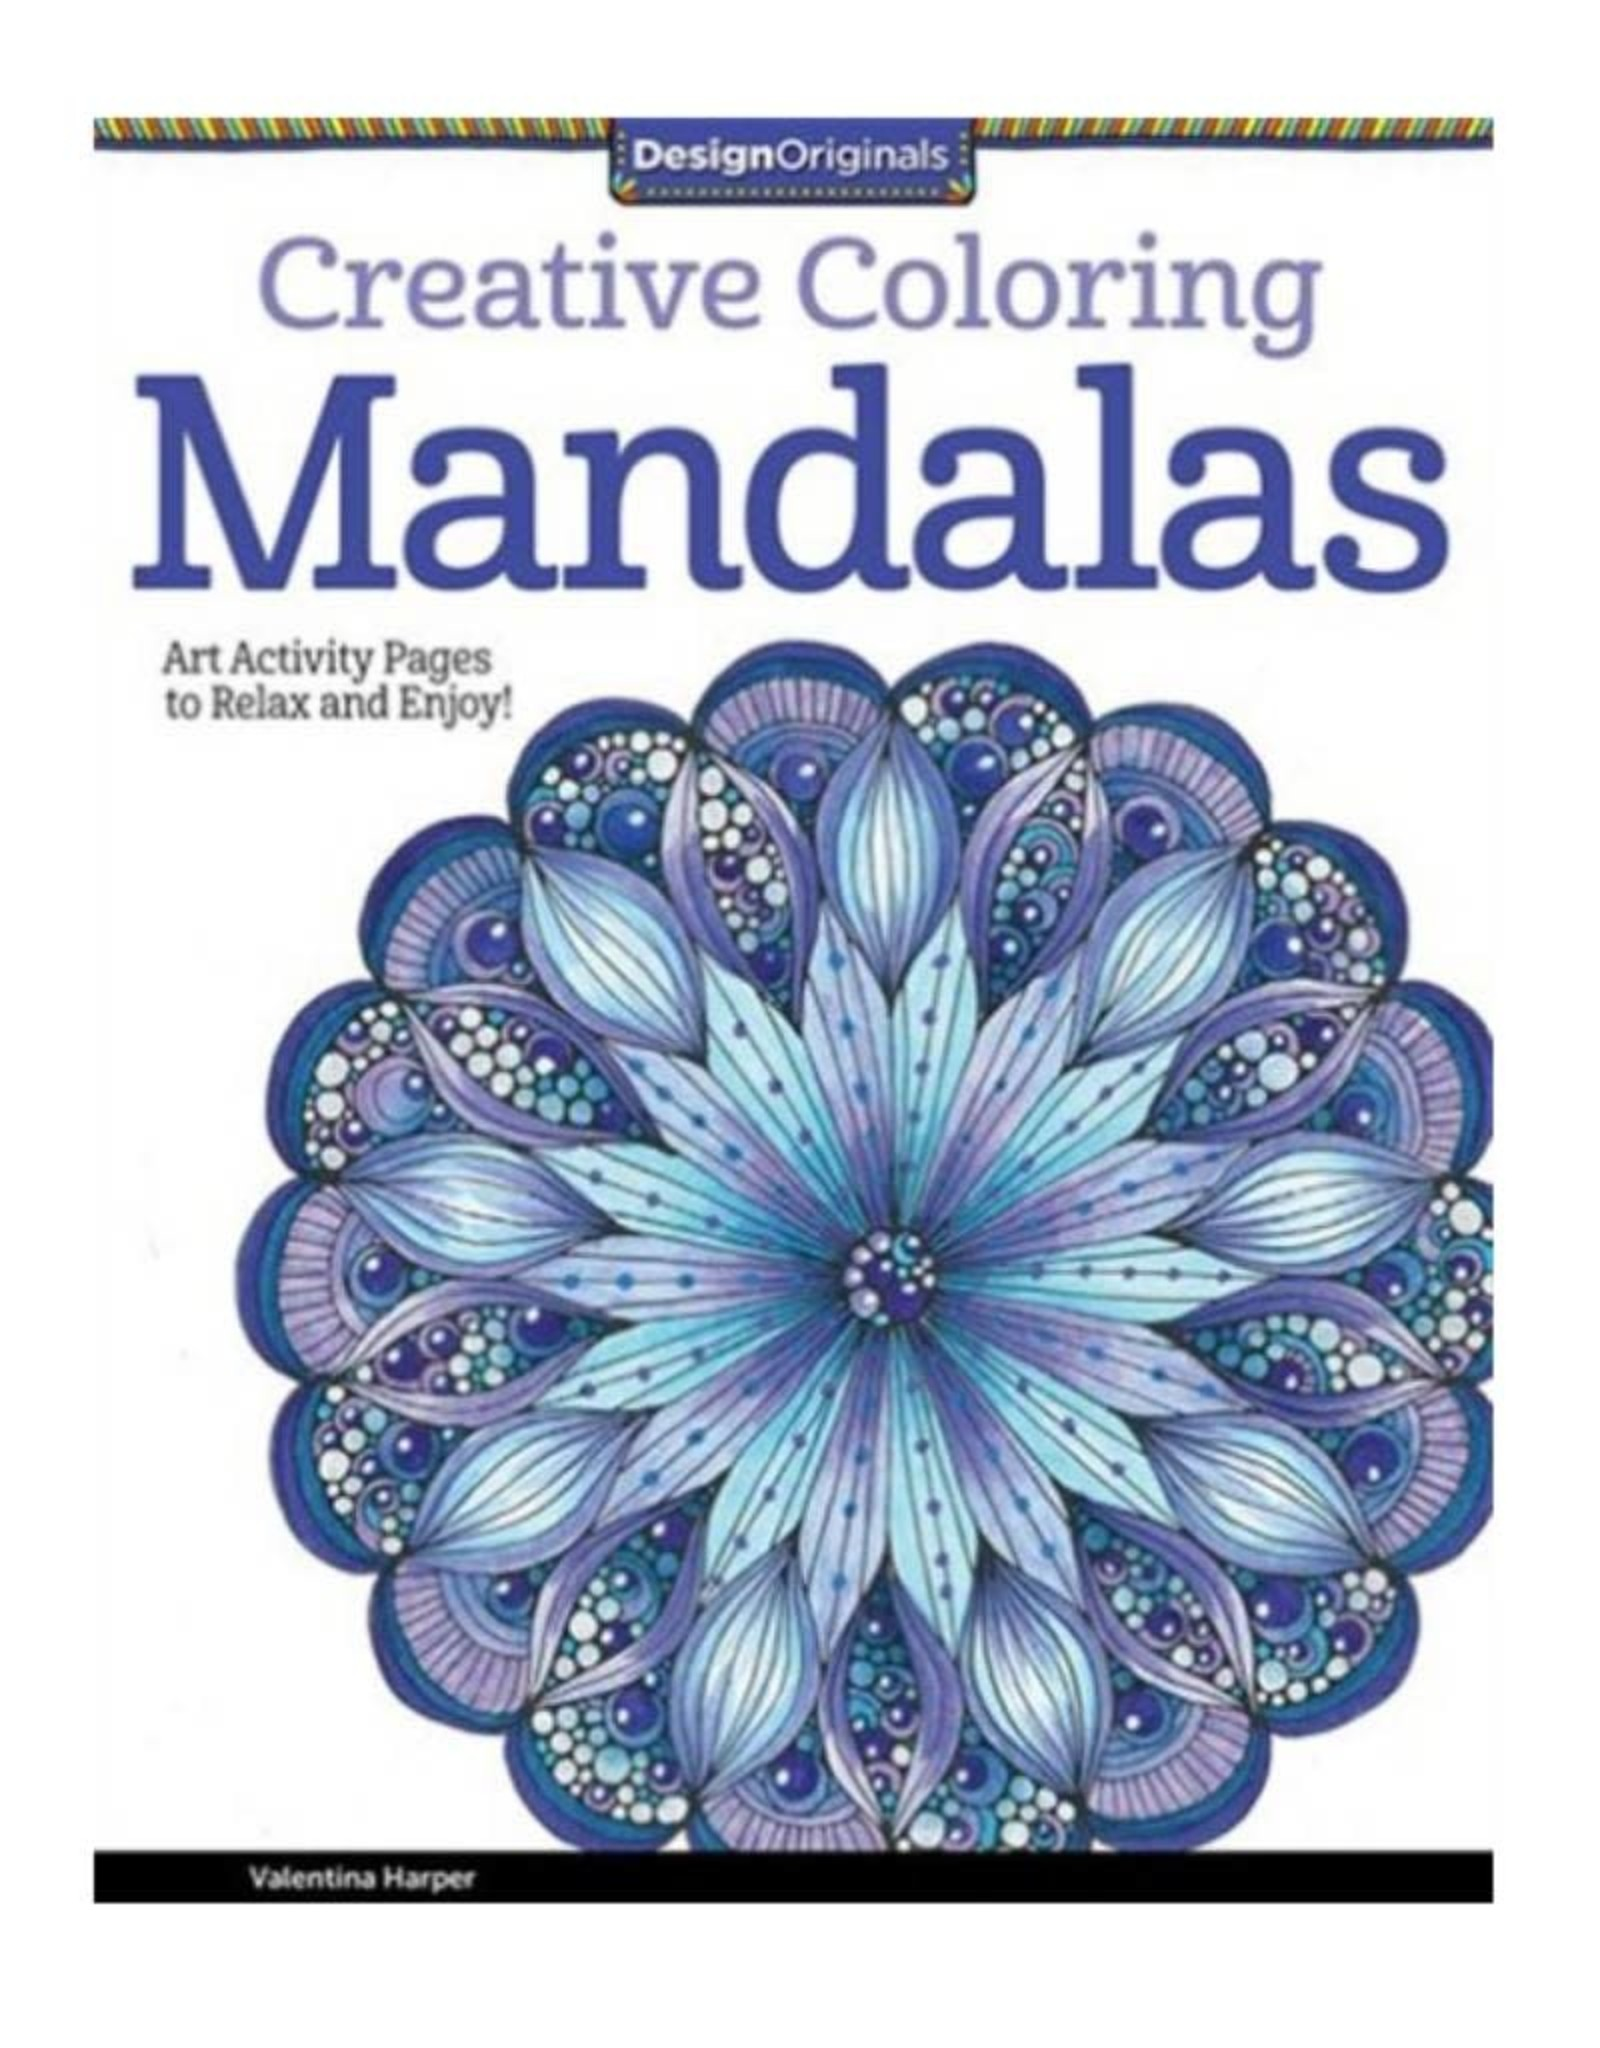 Design Originals Mandalas Colouring Book